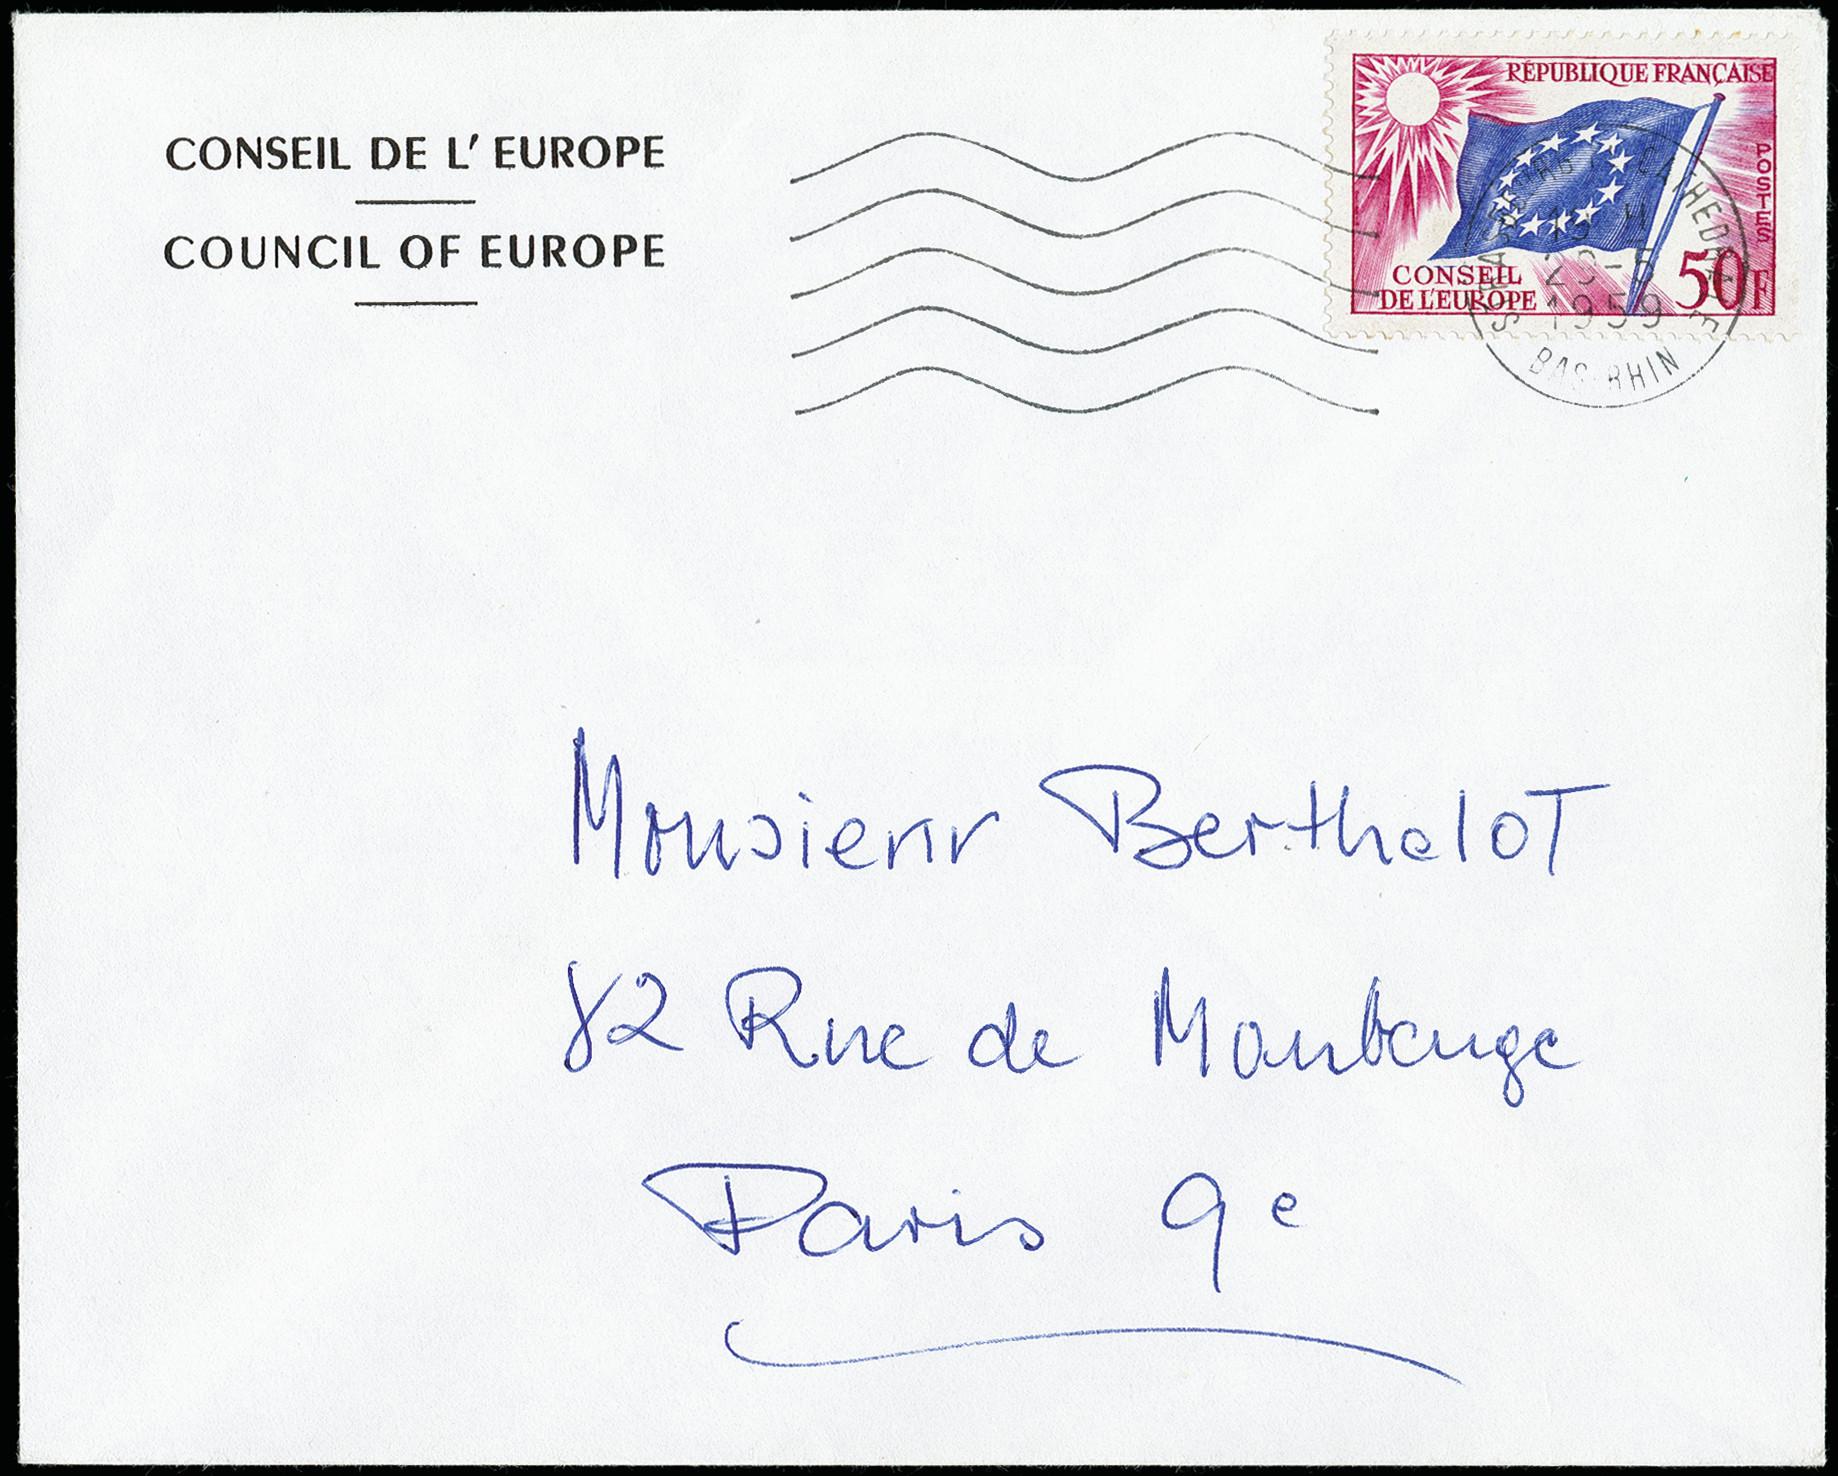 Lot 482 - France France - officials for the European Council -  Heinrich Koehler Auktionen 373rd Heinrich Köhler auction - Day 1